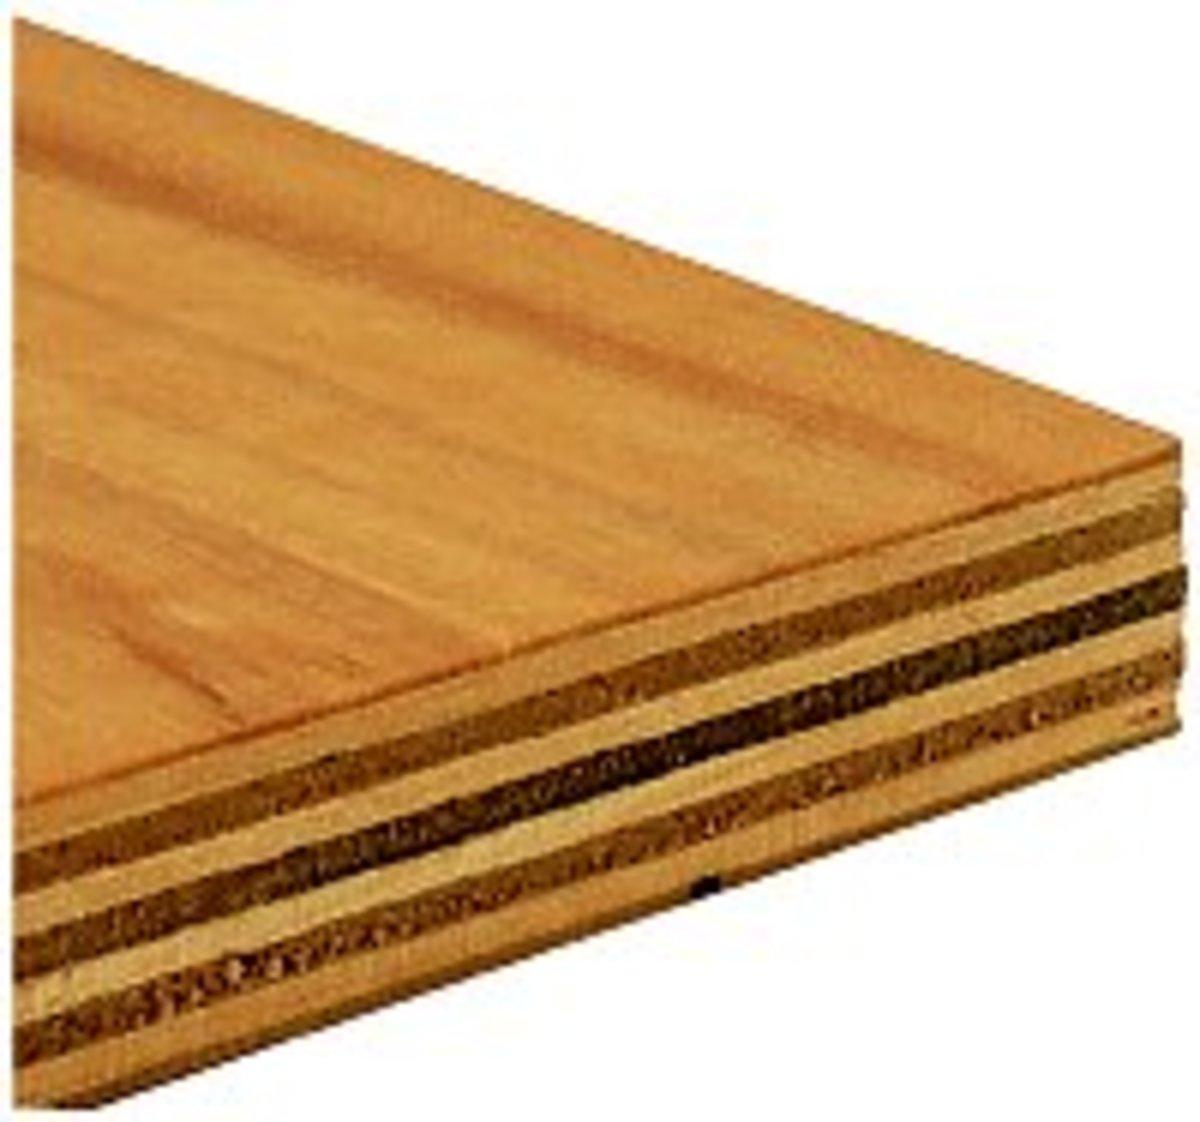 Plywood Edge